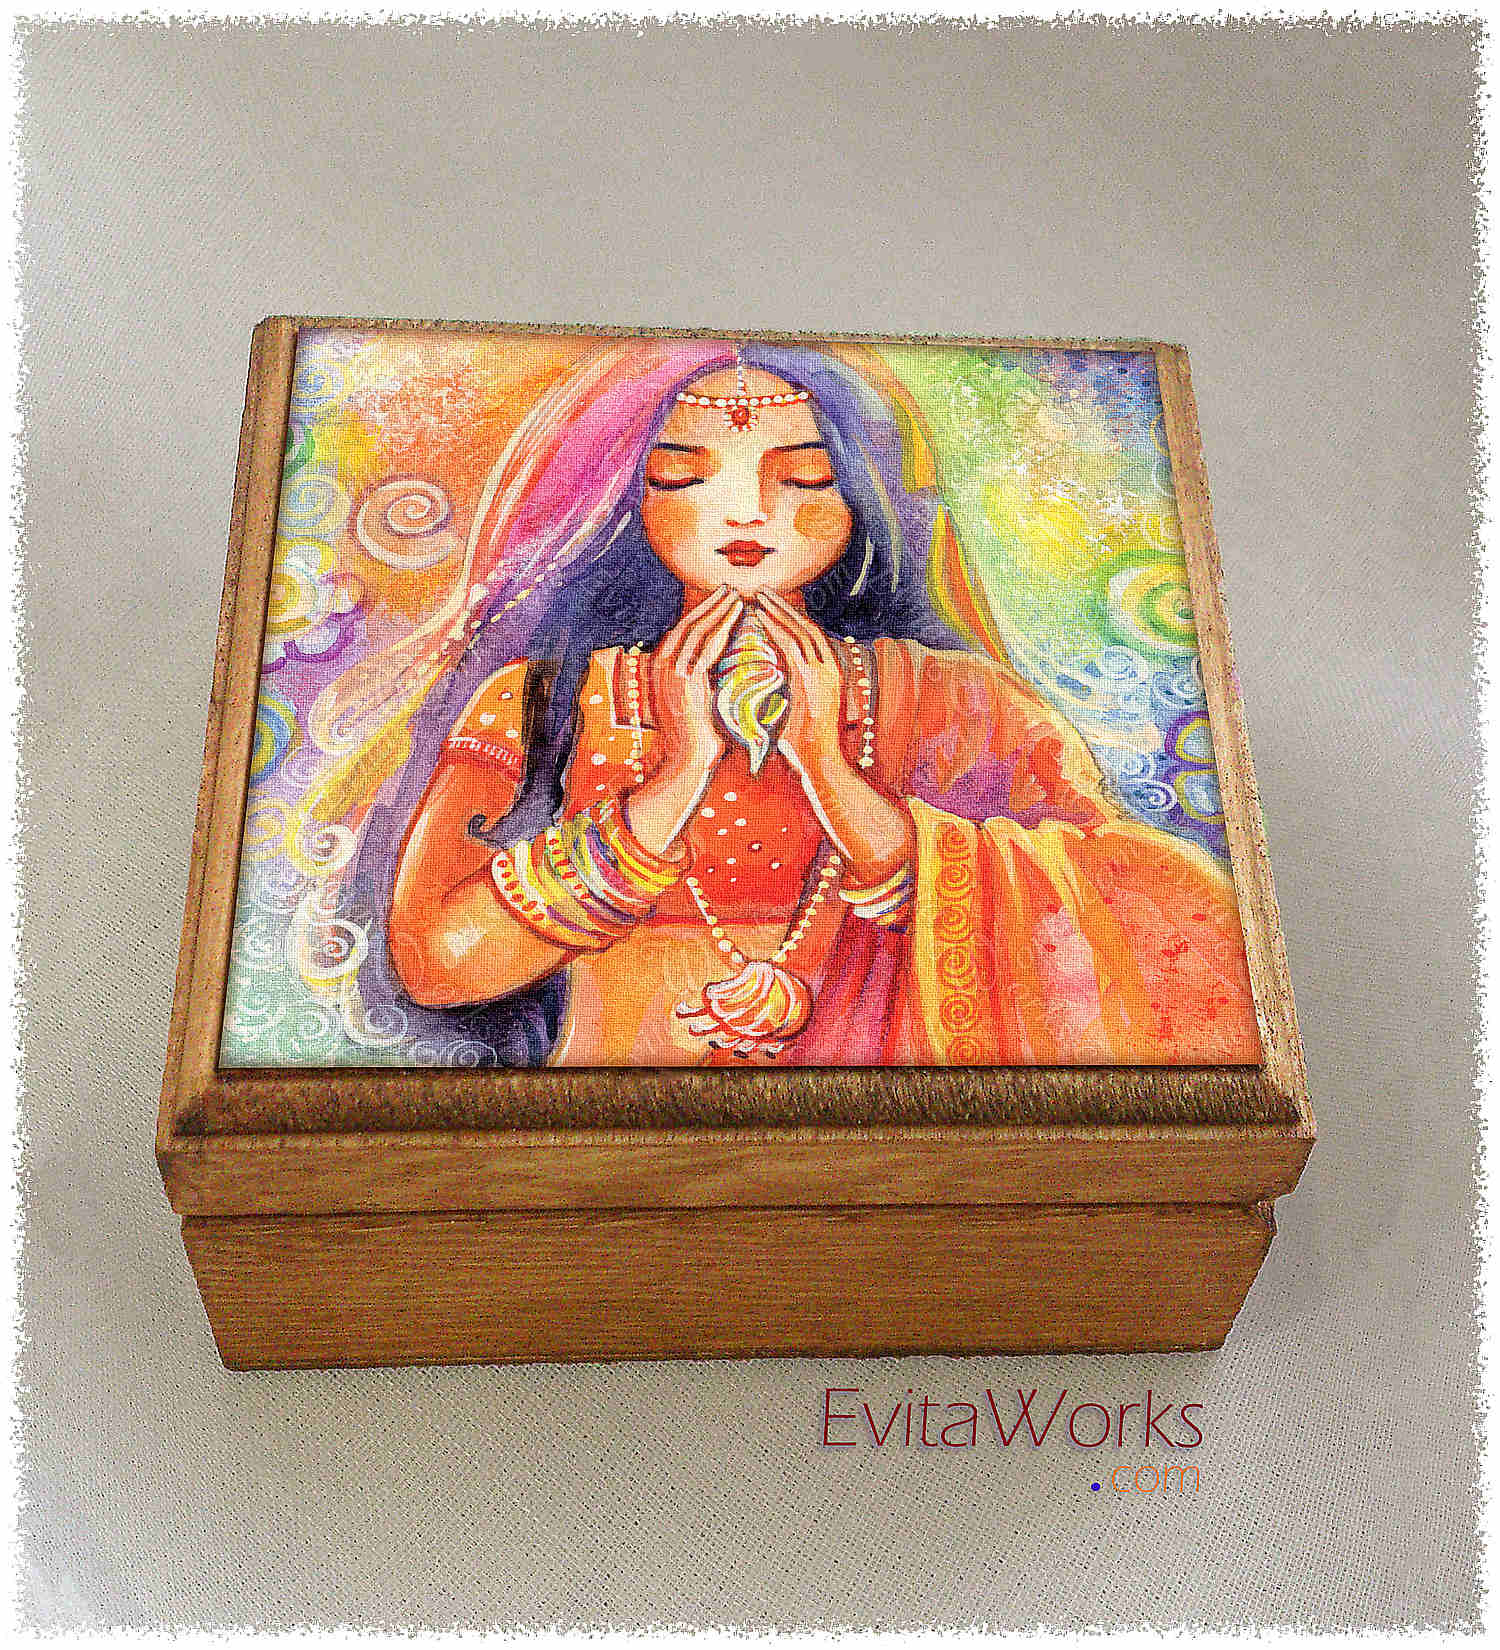 Indian Mermaid 2016 Boxsq ~ EvitaWorks